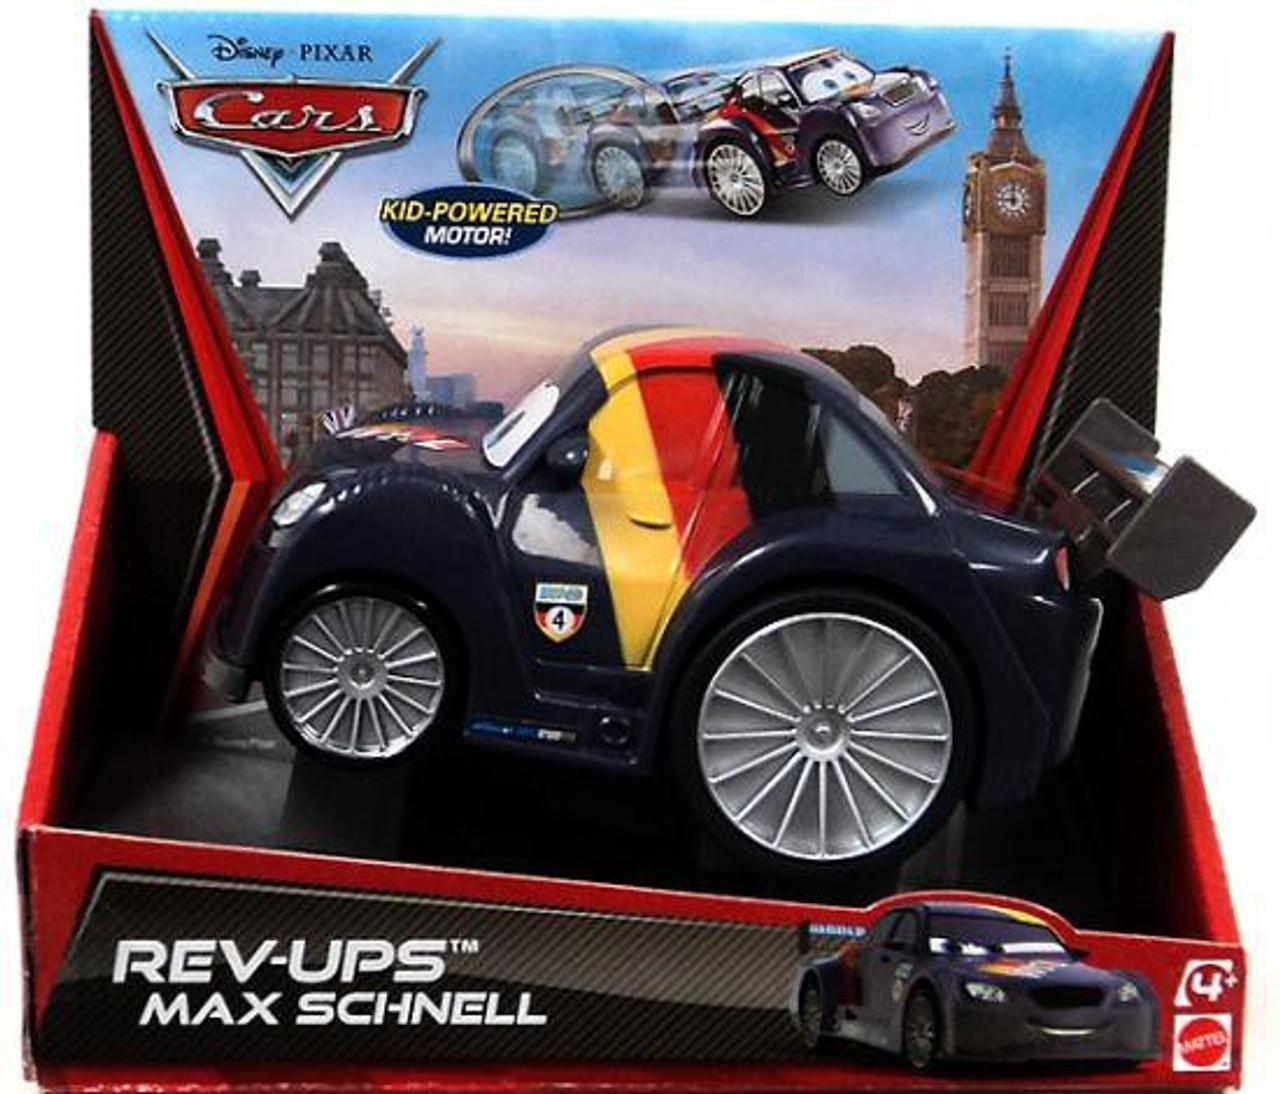 Disney Cars Rev-Ups Max Schnell Plastic Car